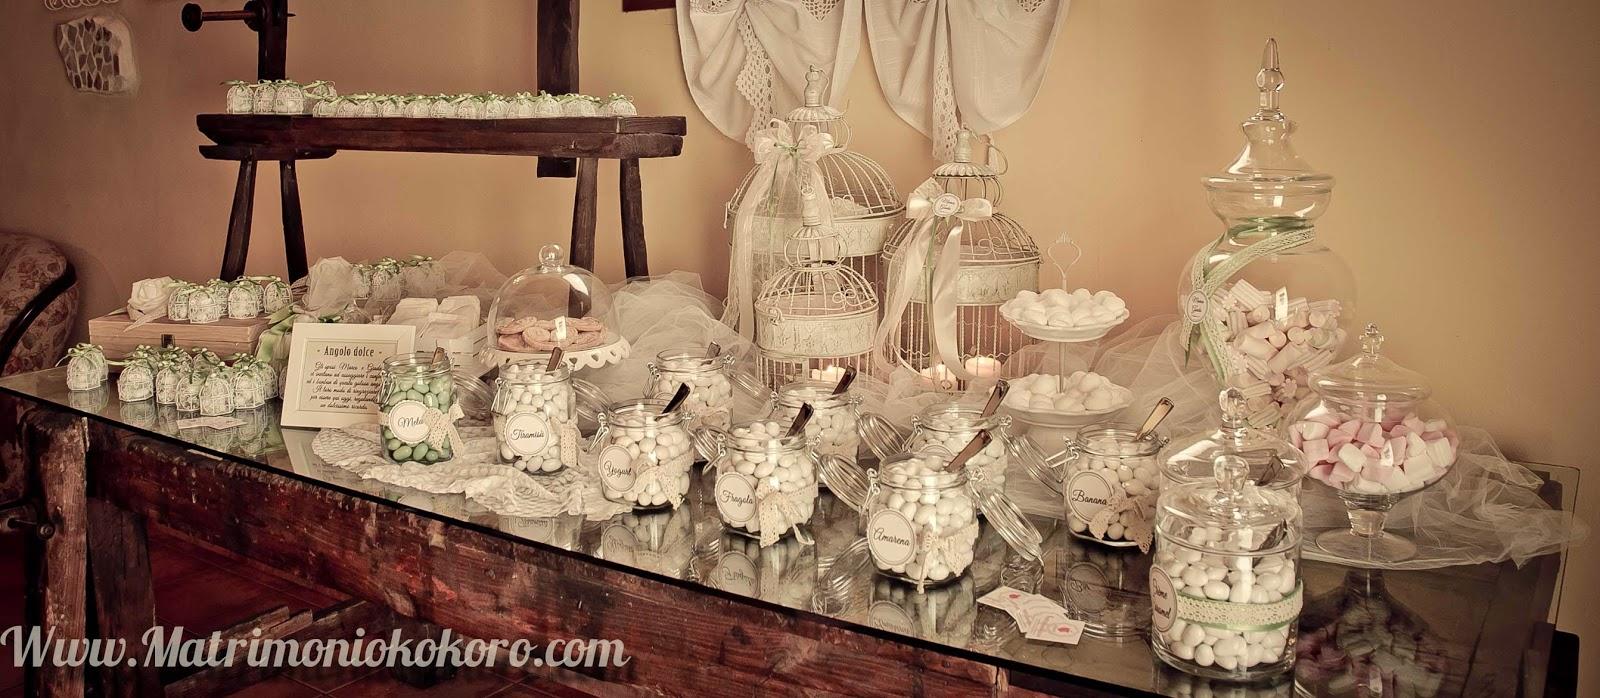 Matrimonio Country Chic Treviso : Kokoro sposi matrimoni battesimi bomboniere padova treviso venezia